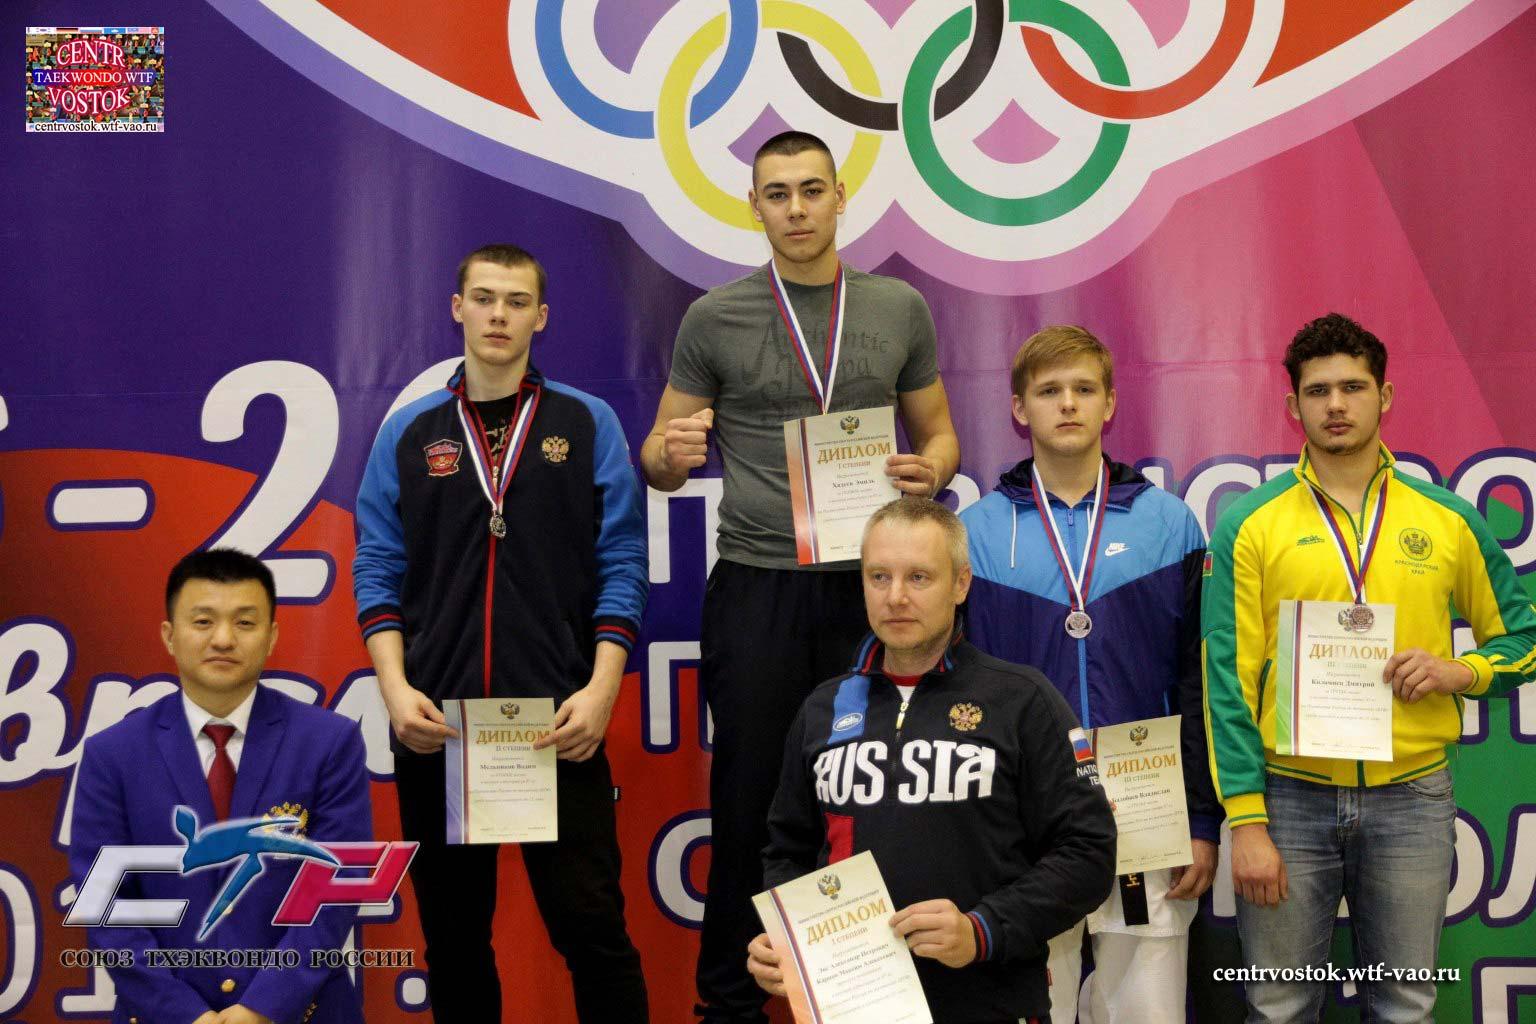 Male_medals_sv87kg